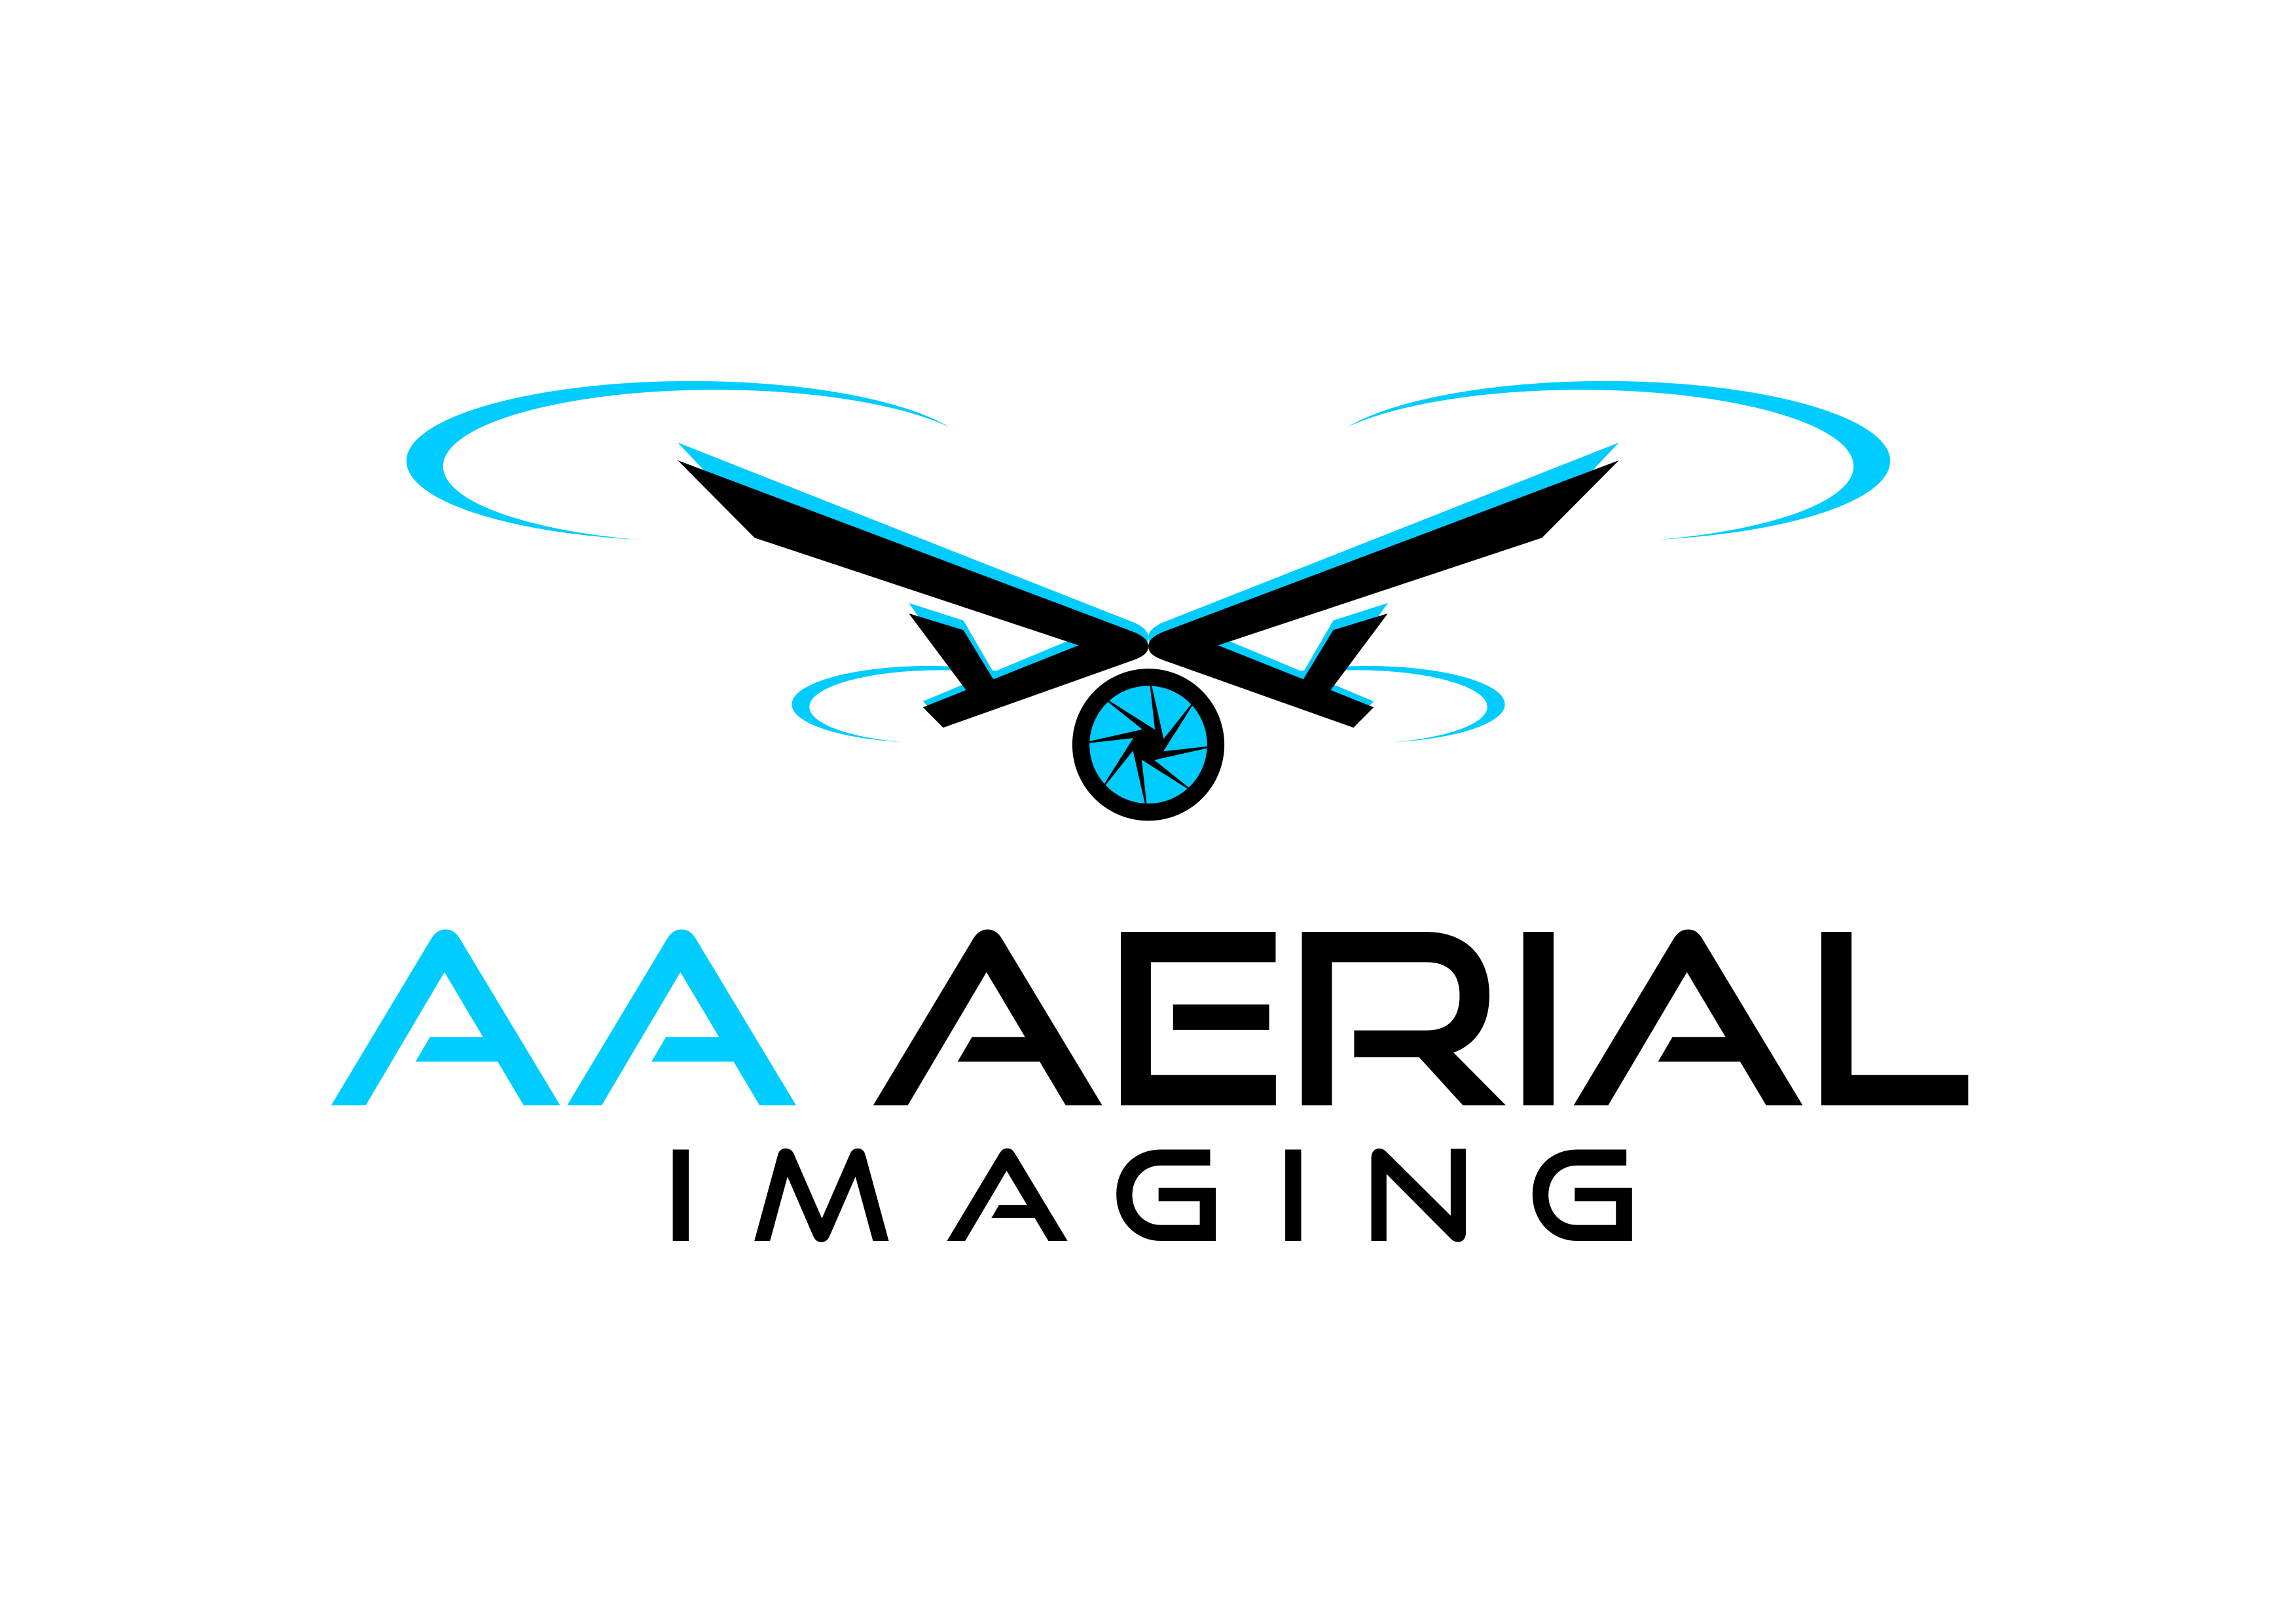 AA Aerial Imaging floor plan in Easton